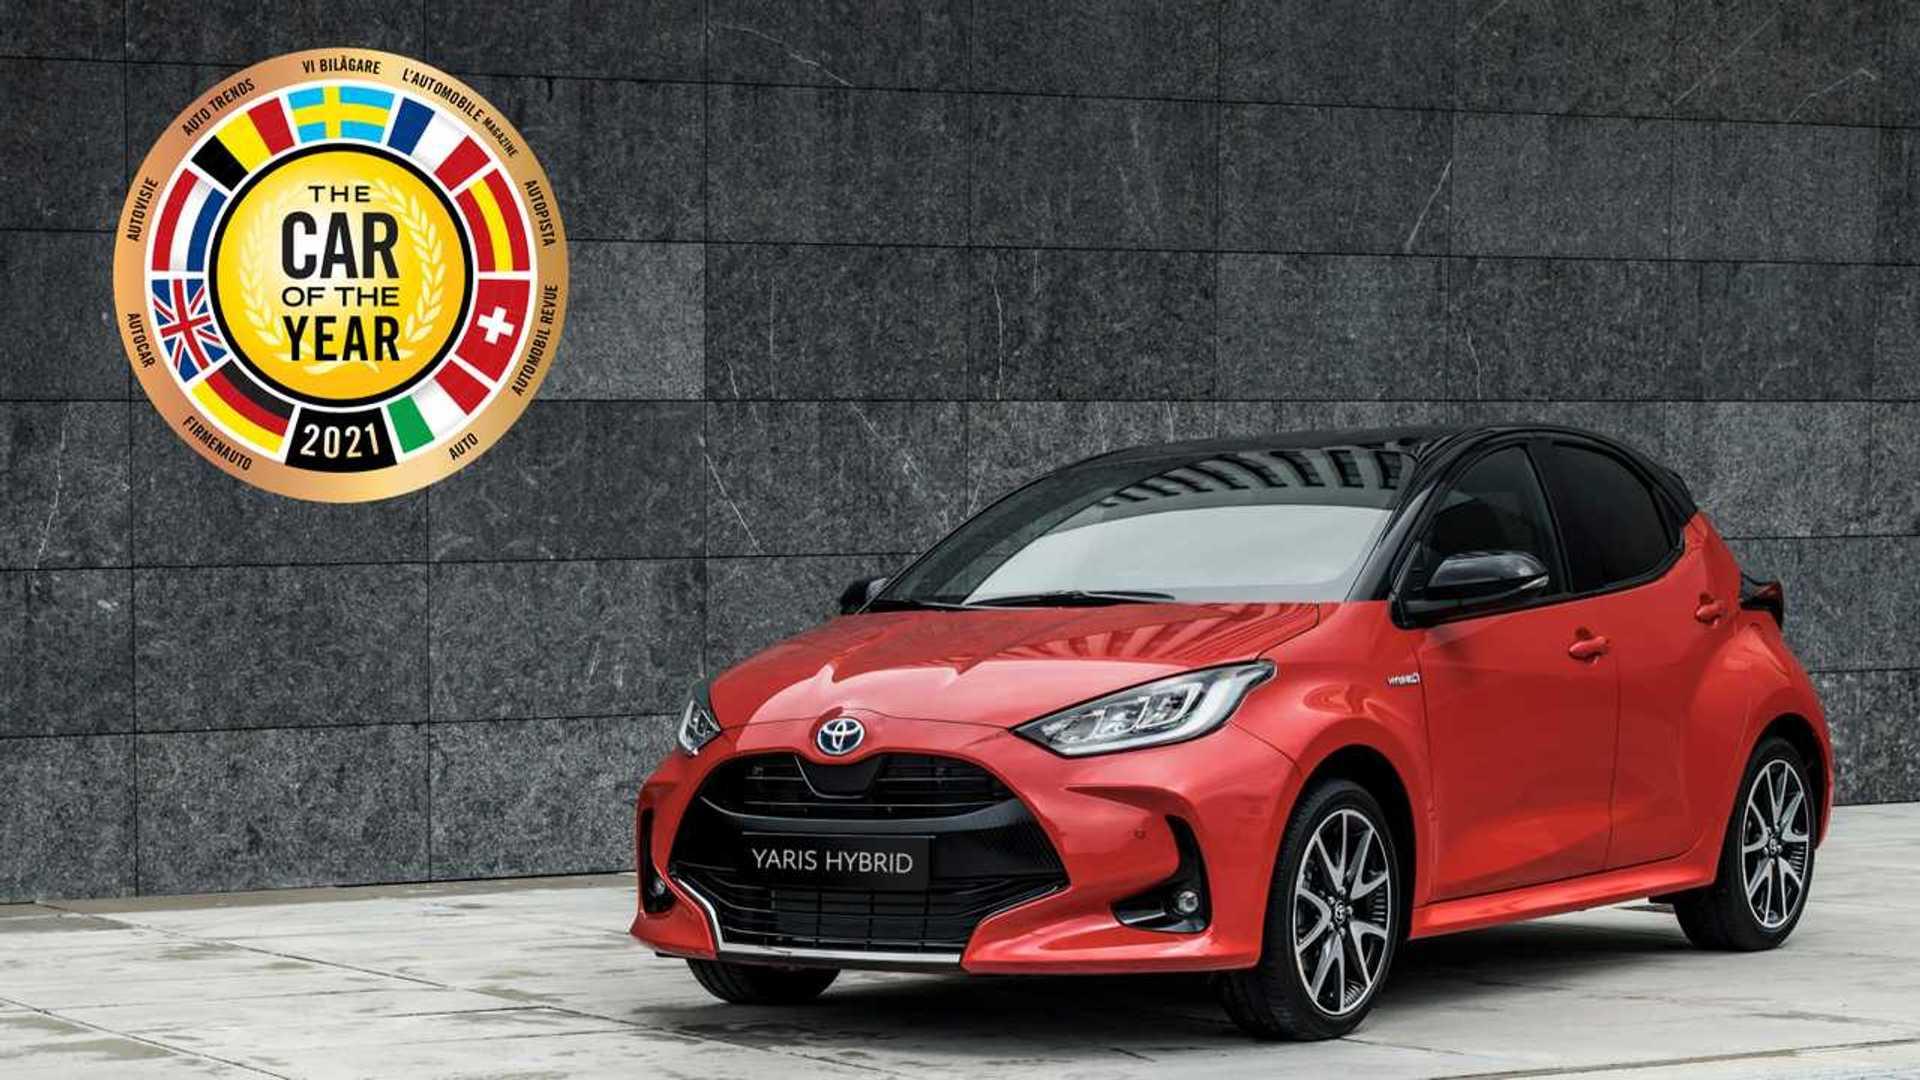 Toyota Yaris Wins European Car Of The Year Award